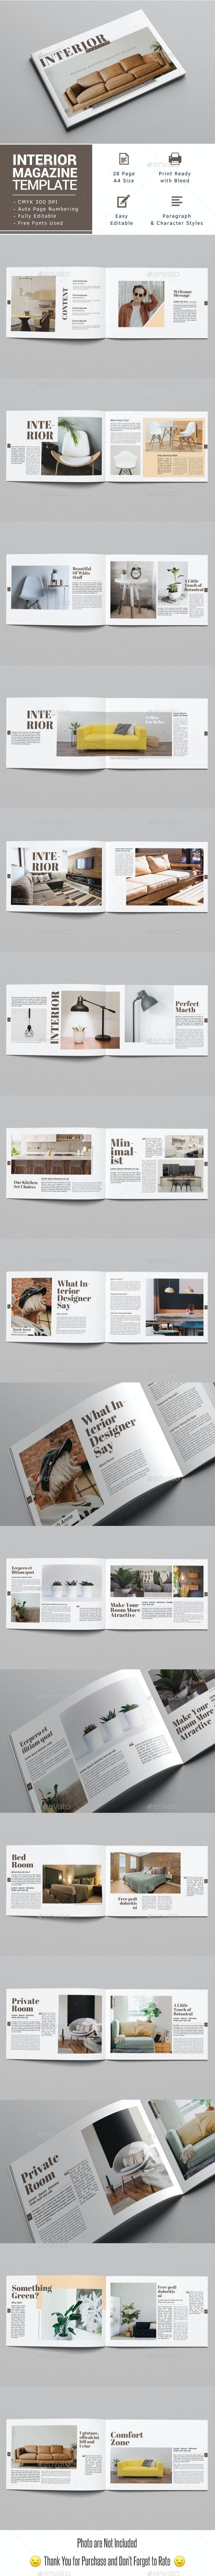 Interior Landscape Magazine Template - Magazines Print Templates